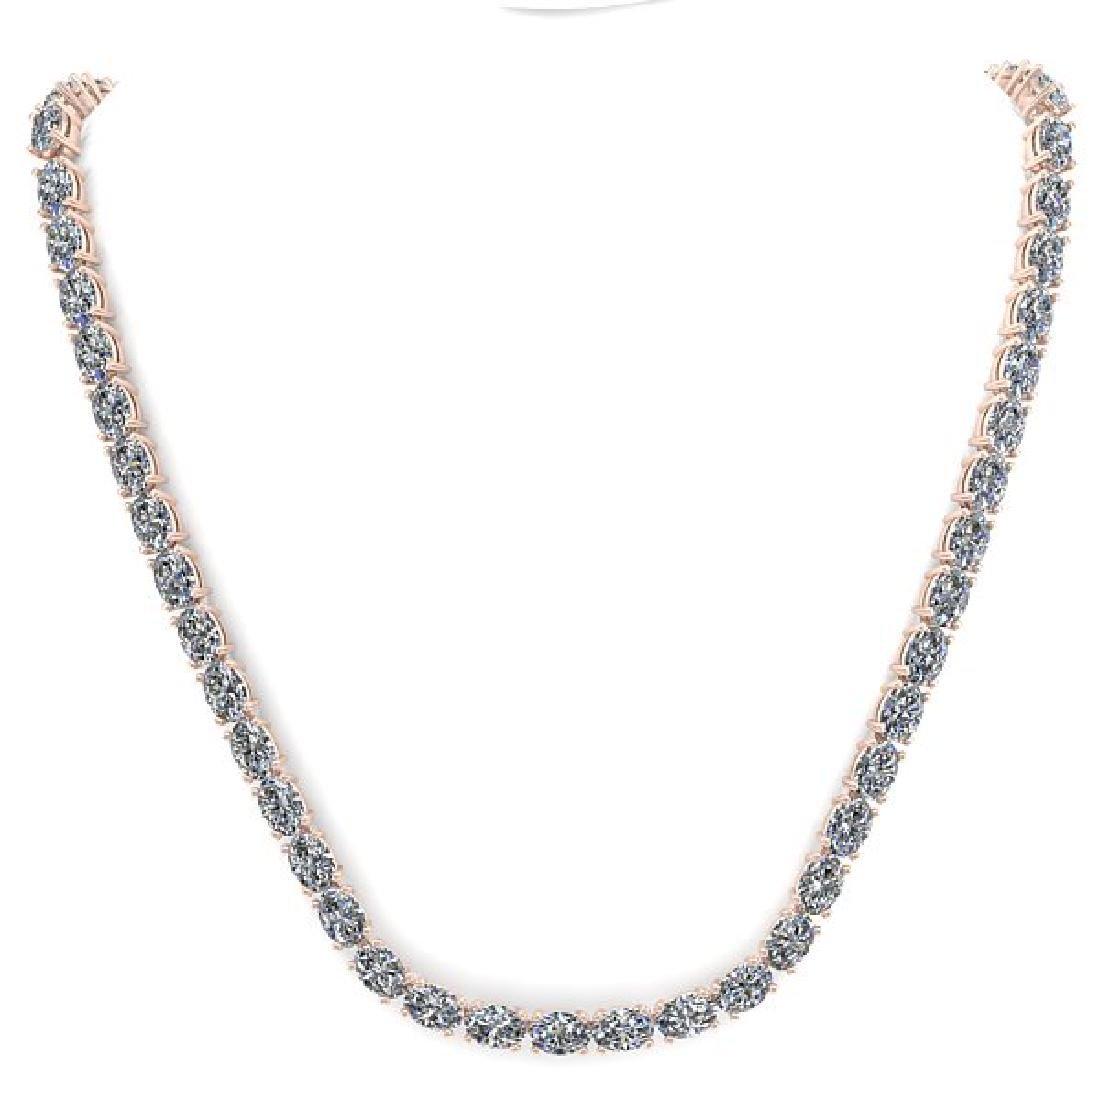 26 CTW Oval Cut Certified SI Diamond Necklace 14K Rose - 2